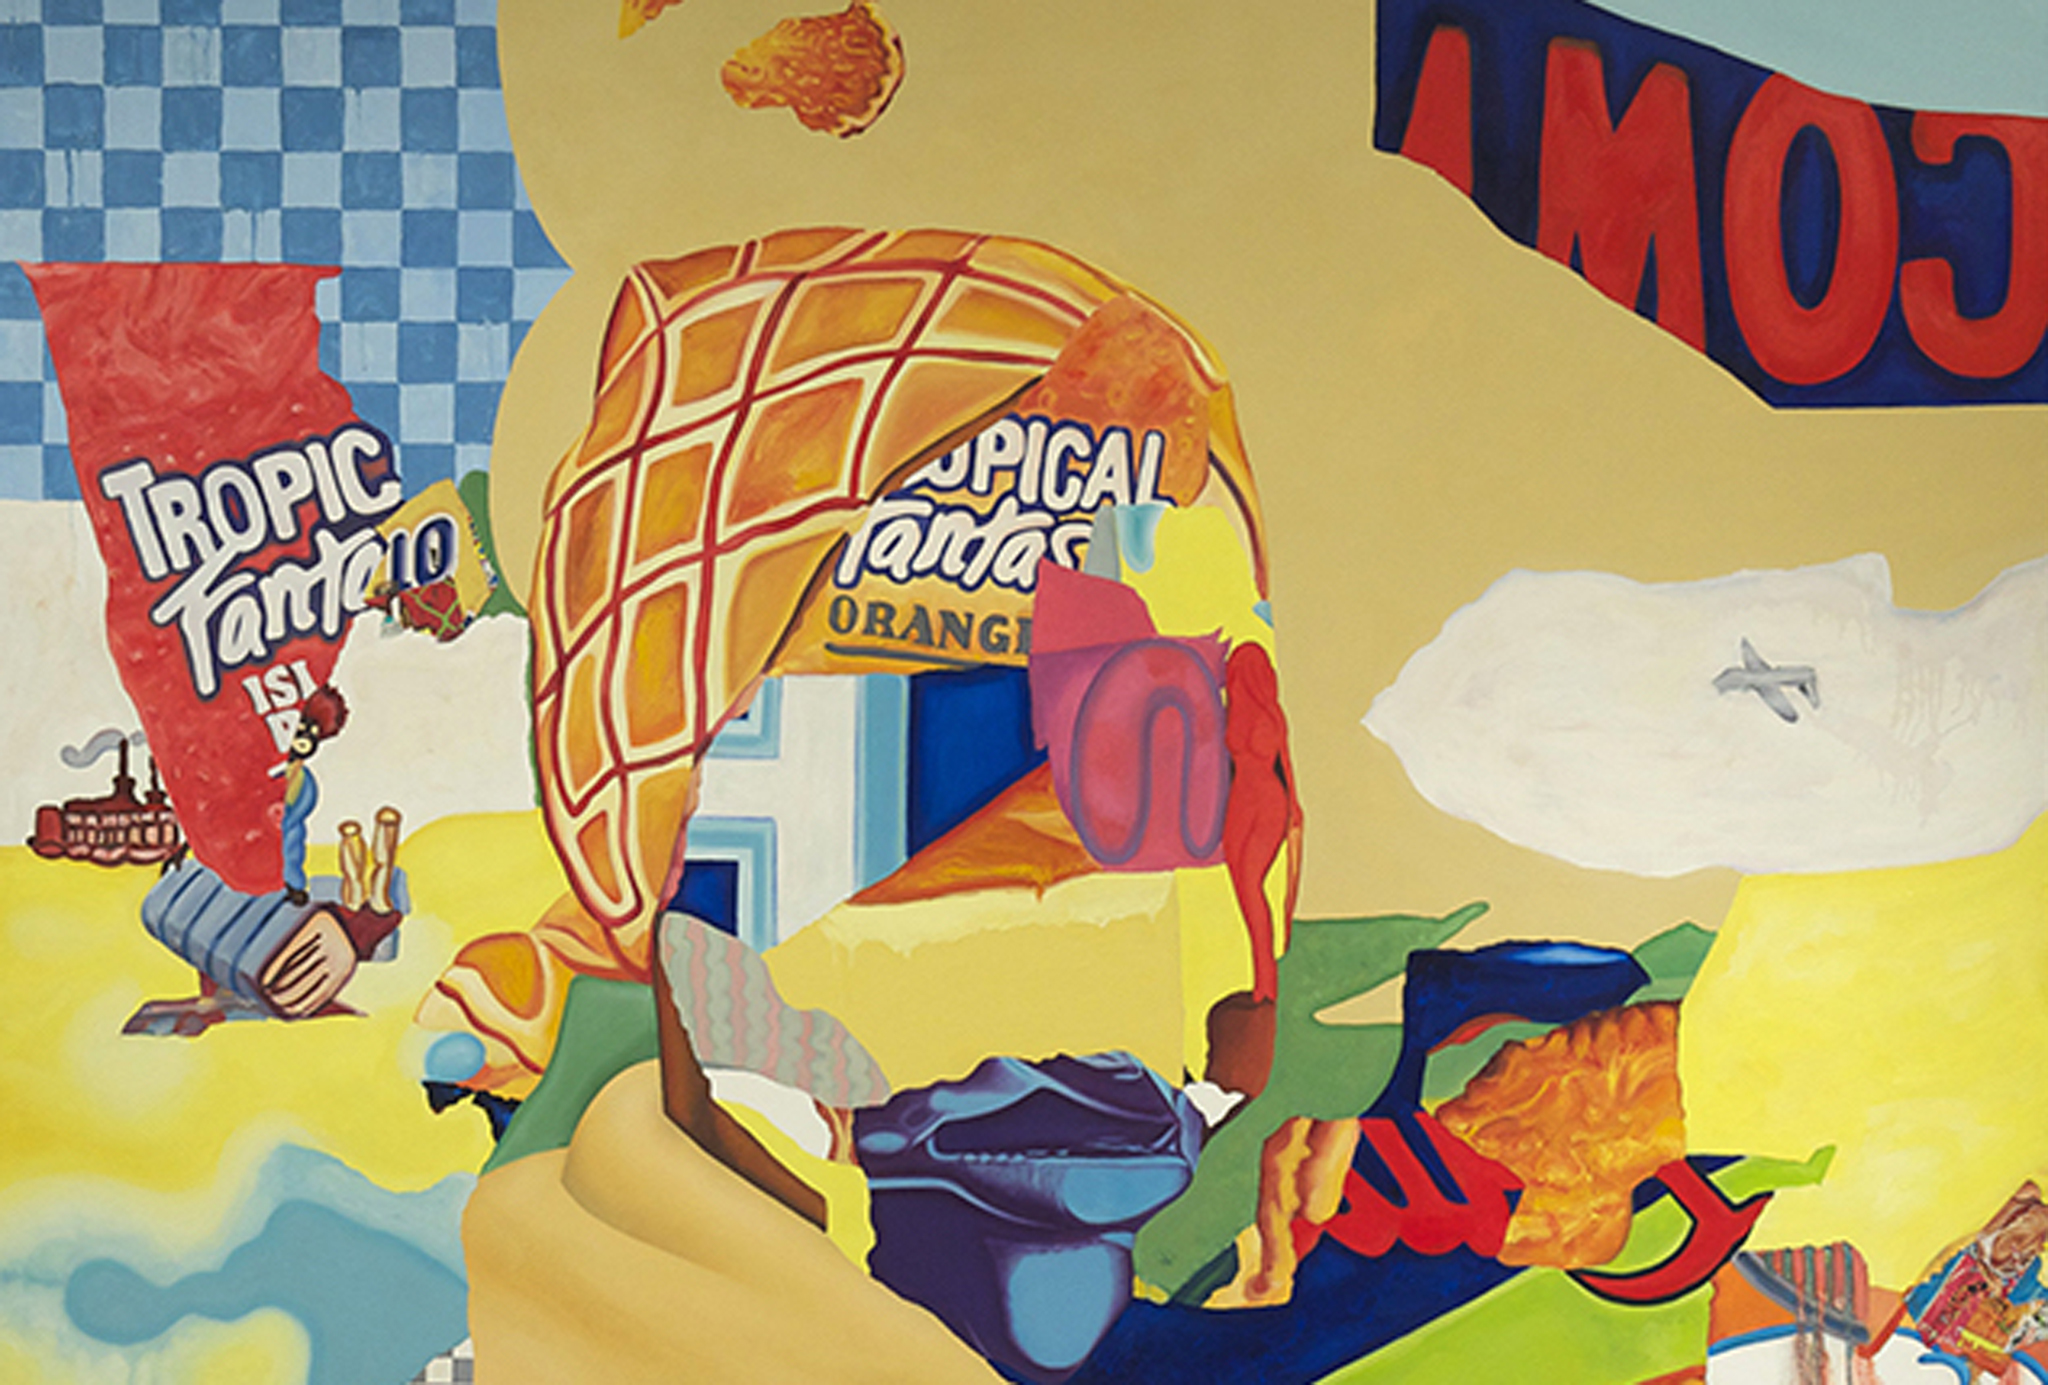 Harlem art fair launches the same week as Frieze New York